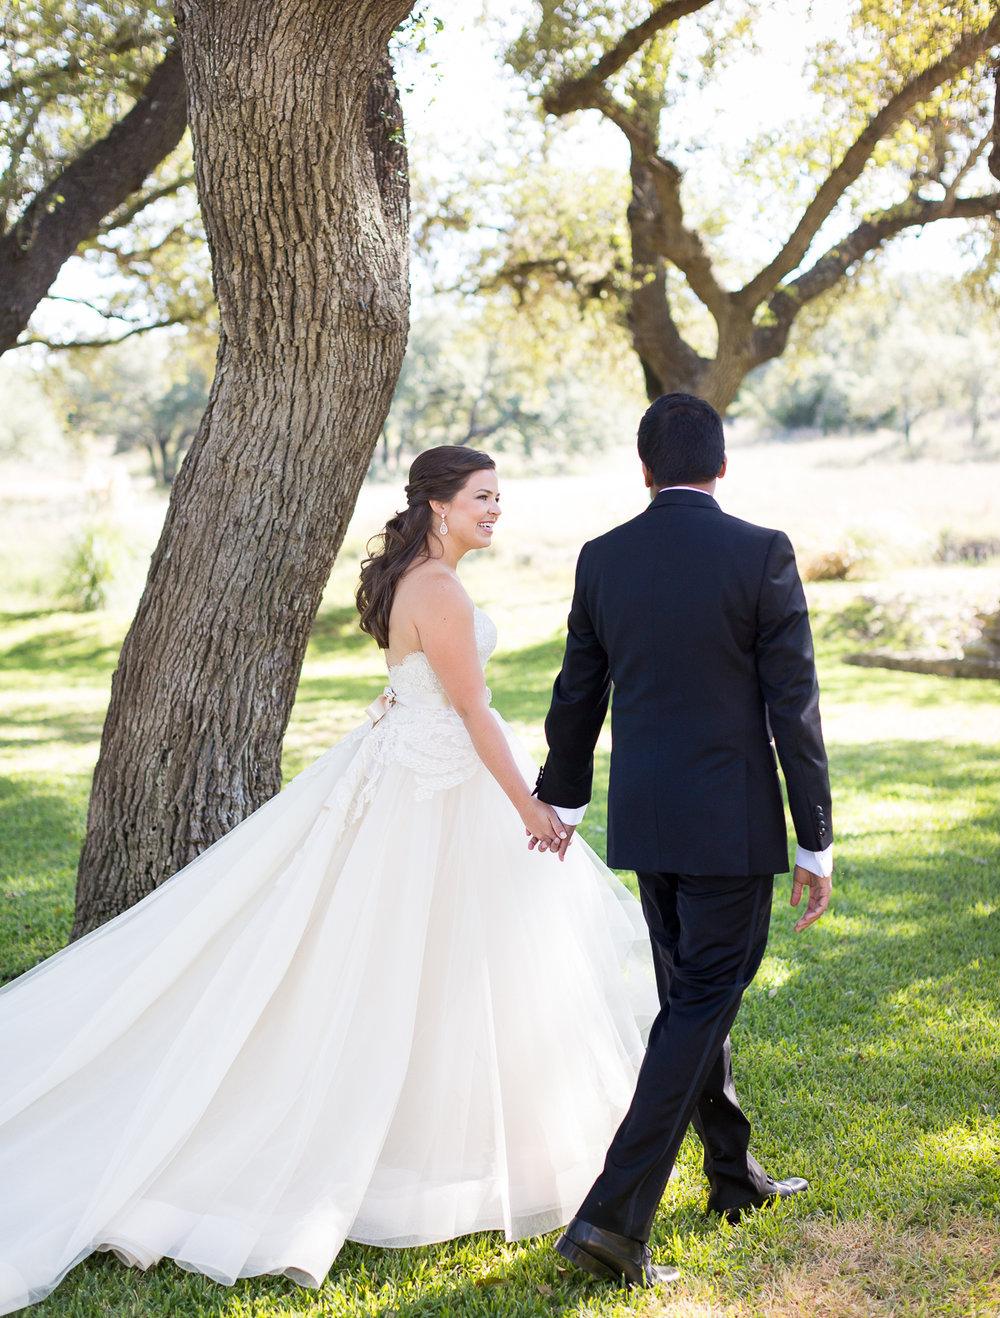 hill-country-wedding-photographer-001.jpg